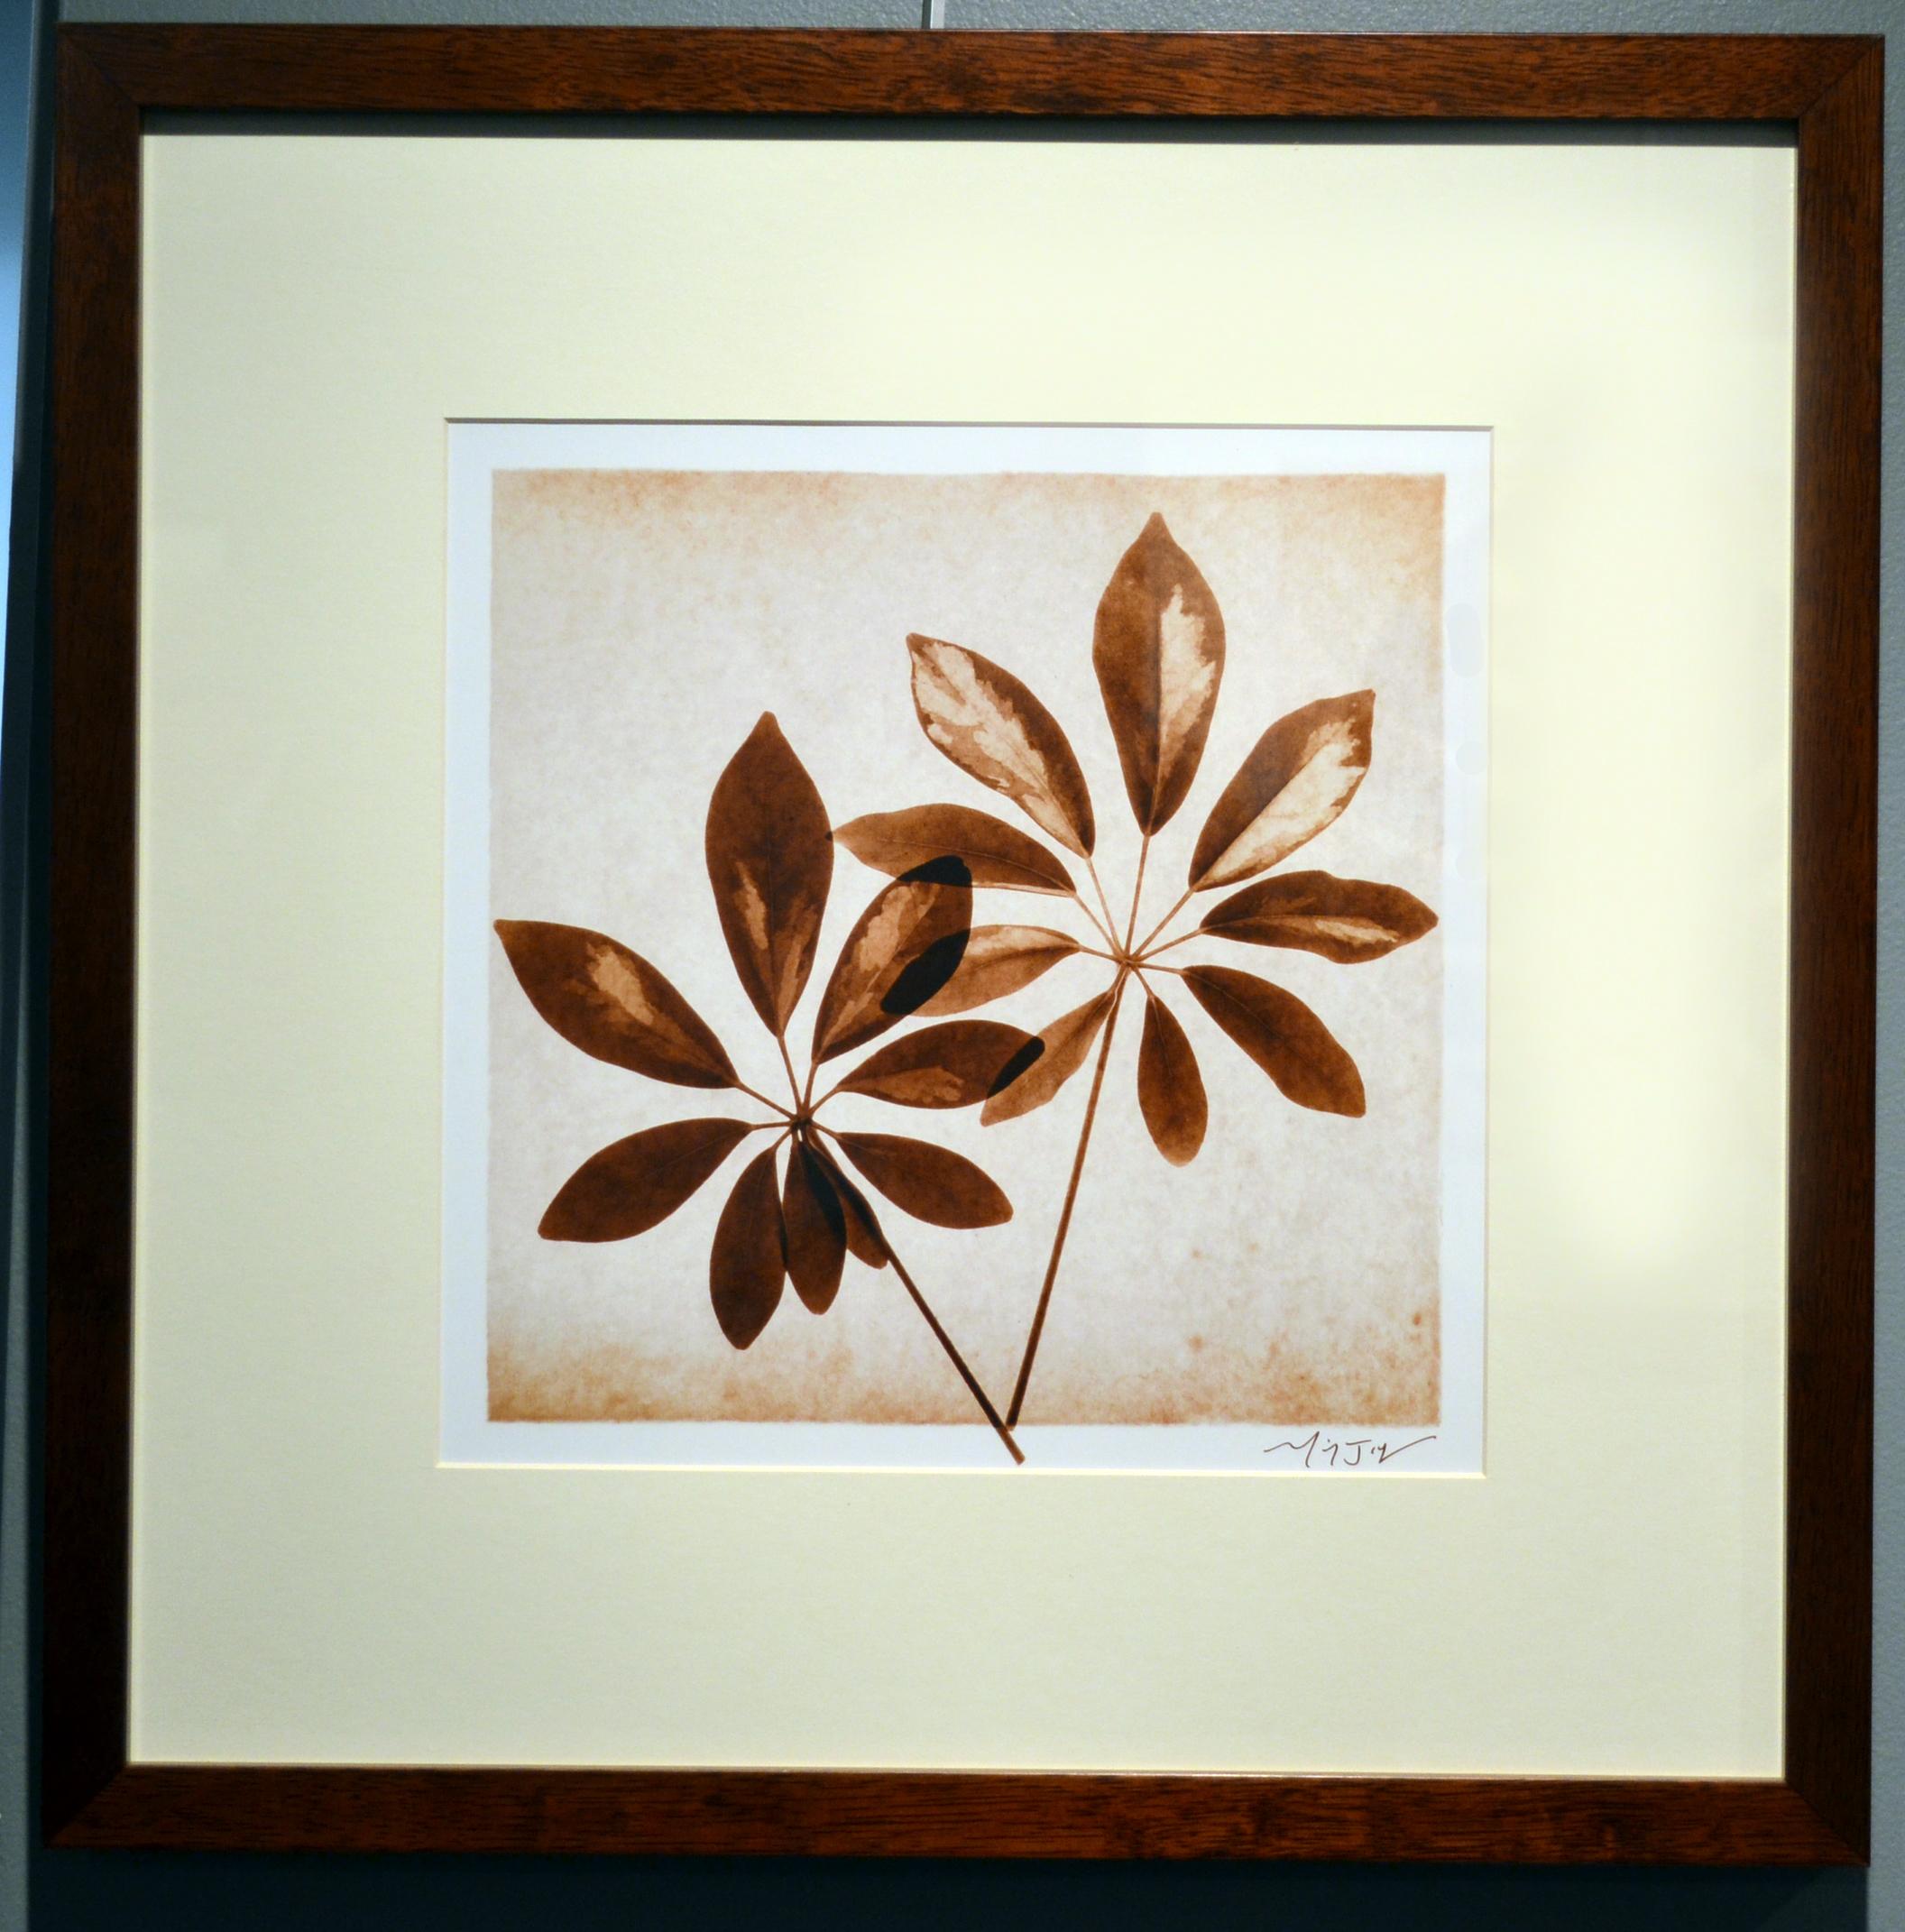 Schefflera Leaves by Michael Mandolfo